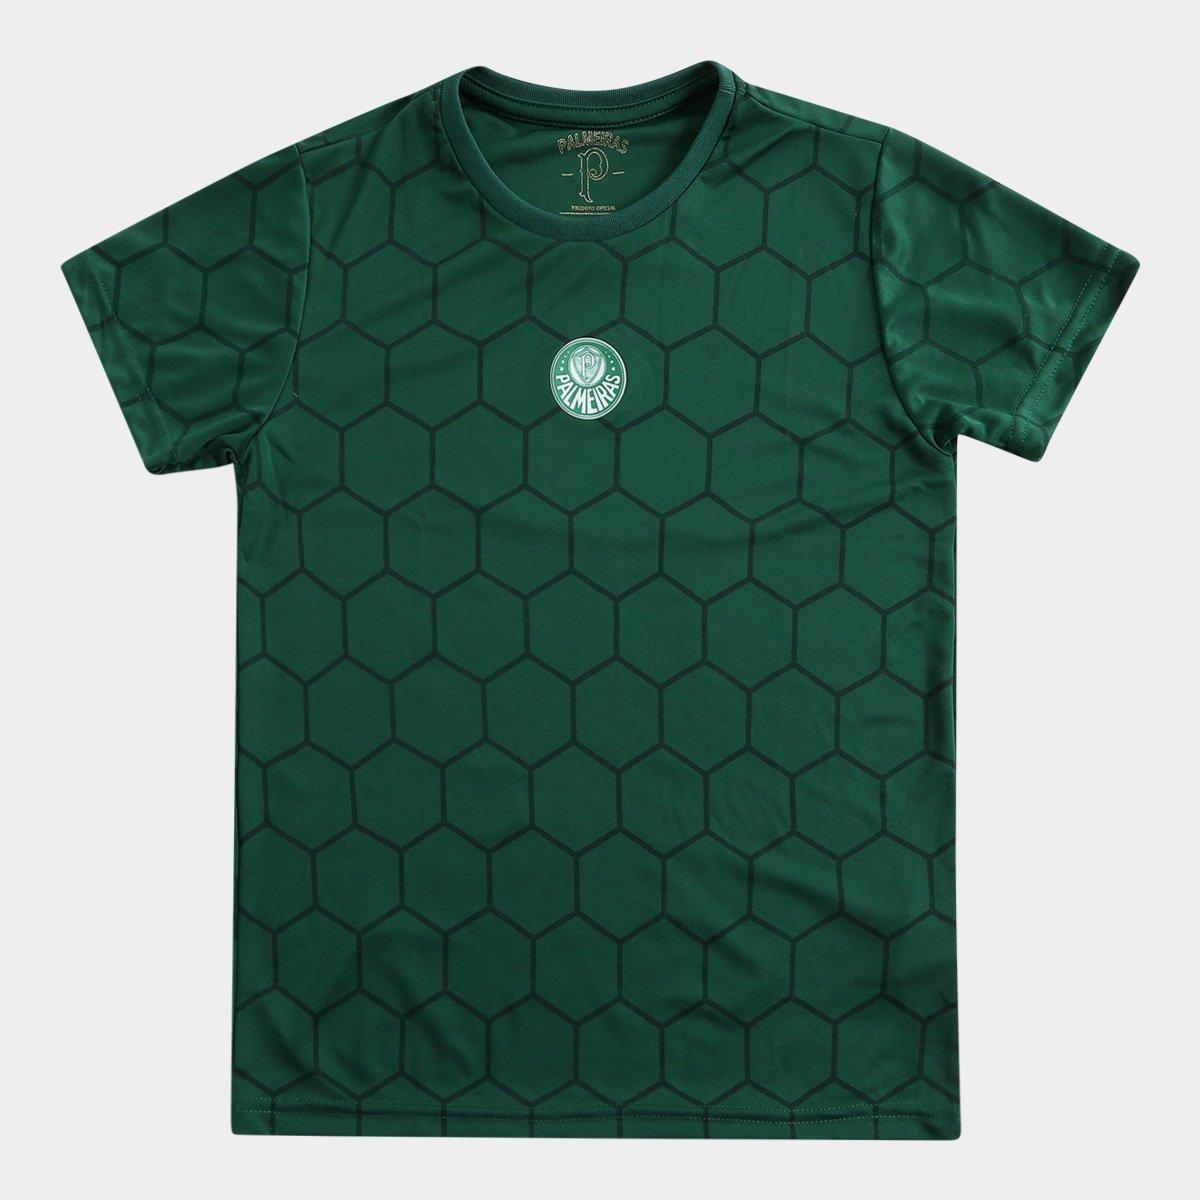 4601cc16d4 Camiseta Palmeiras Infantil Sublimada Ton - Compre Agora